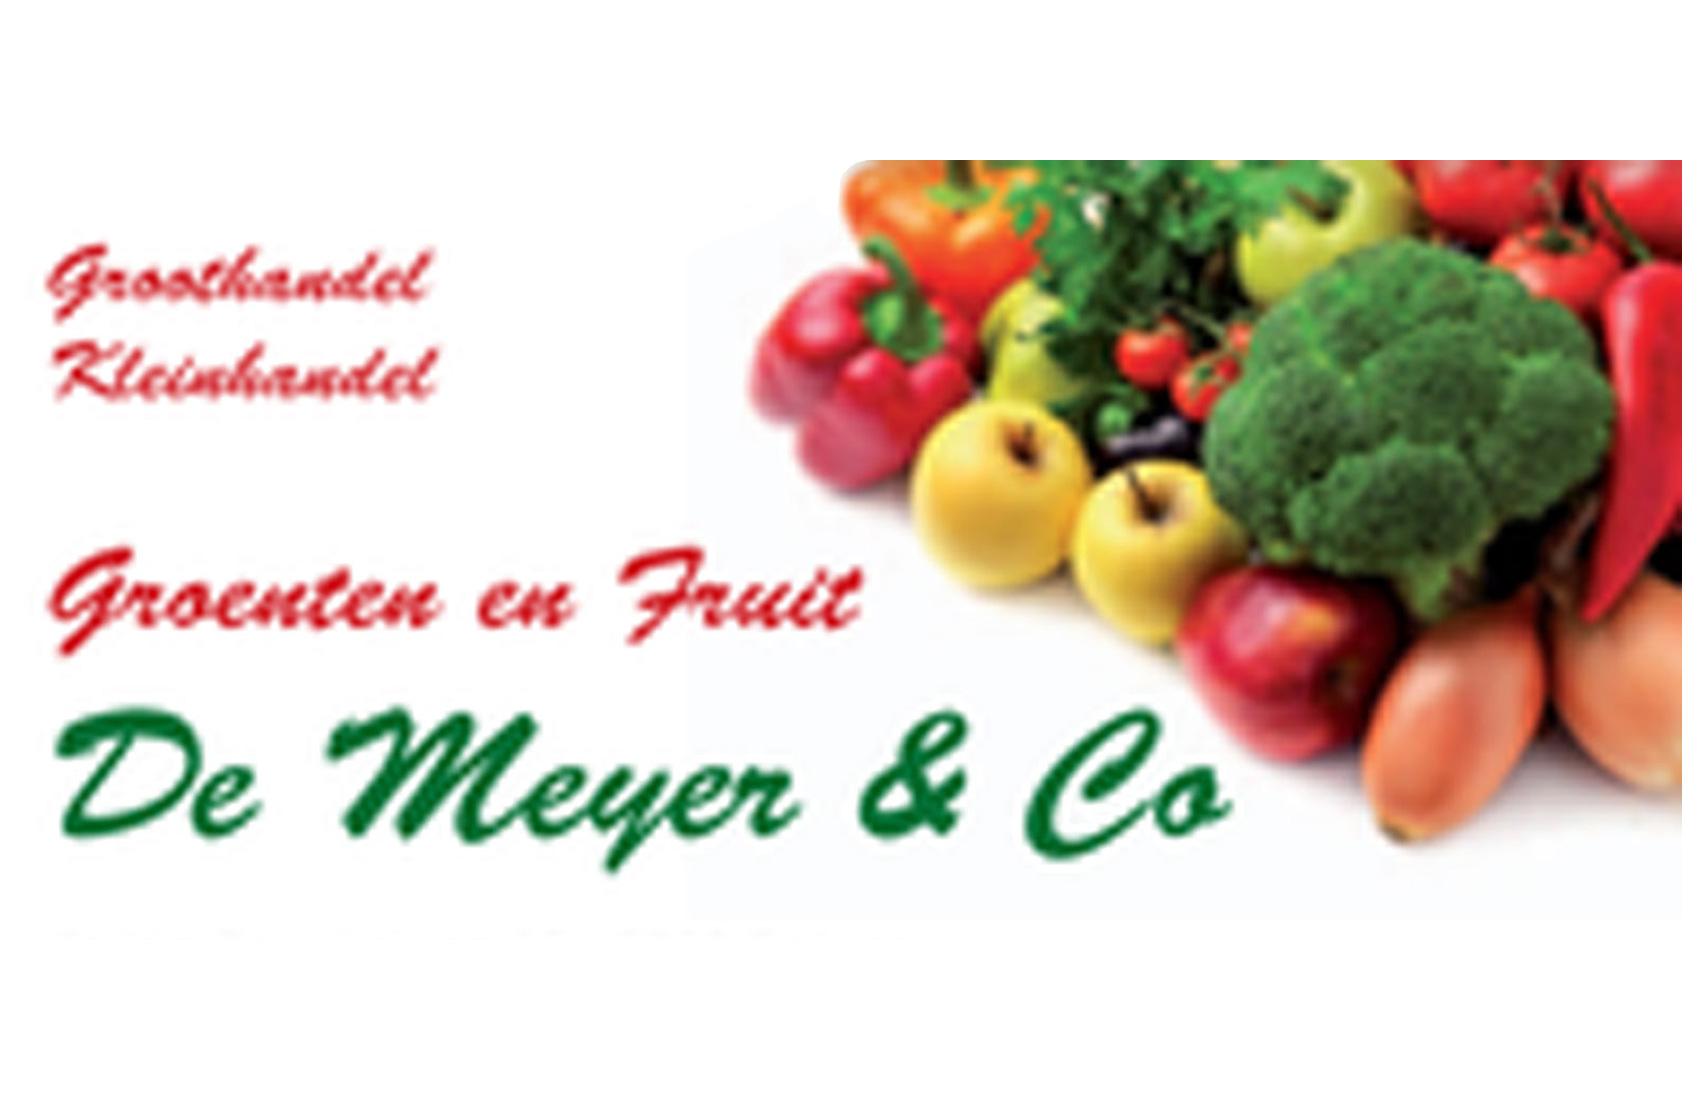 De Meyer & Co groenten & fruit